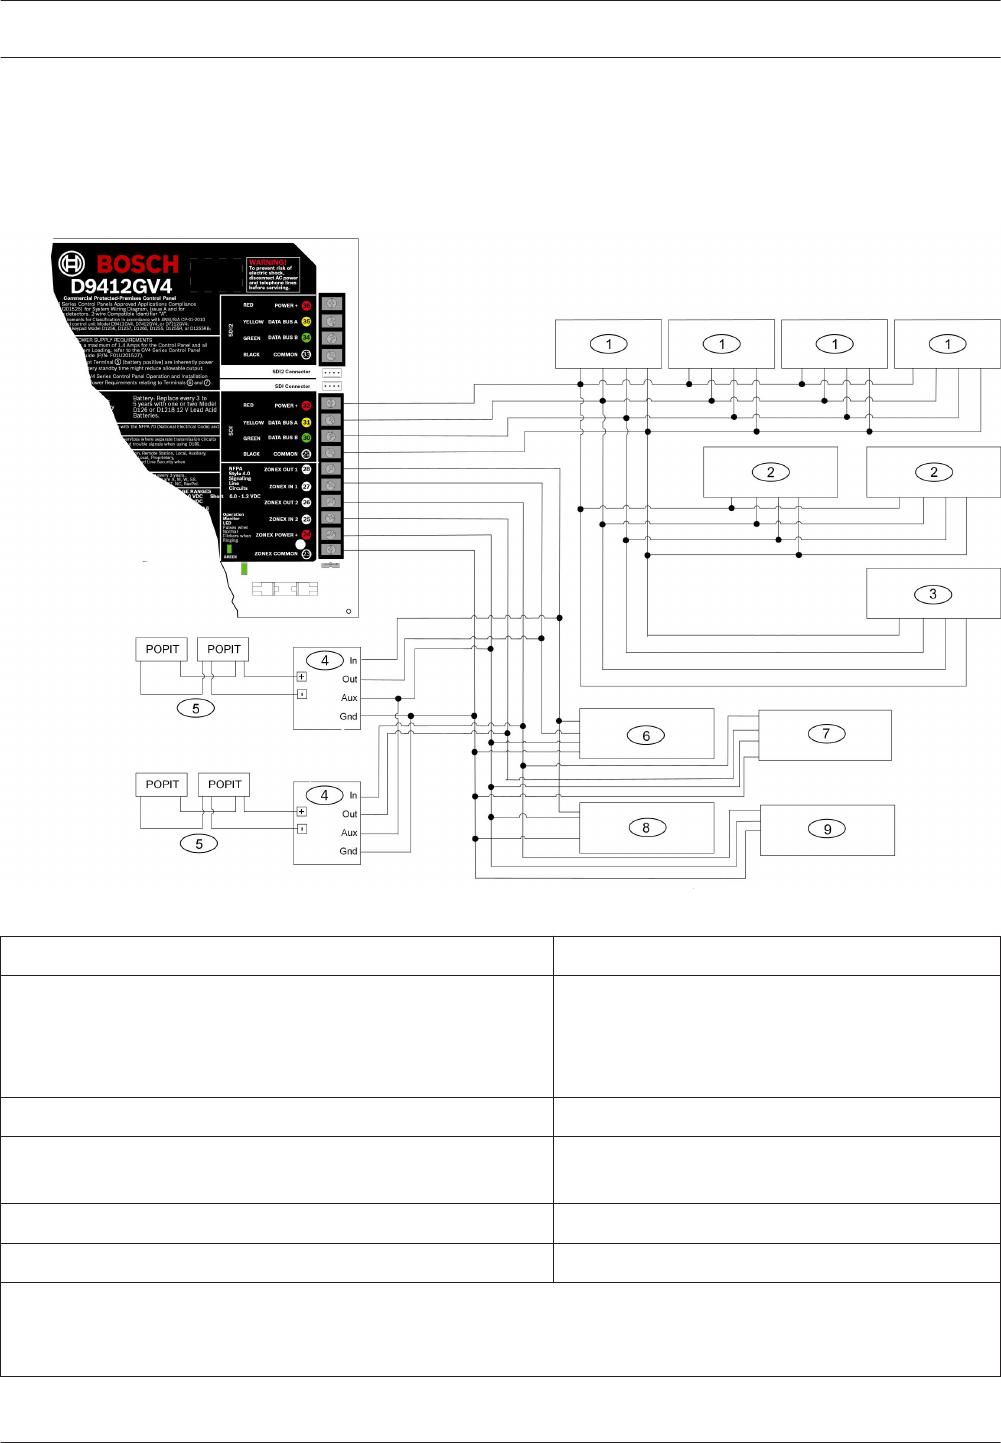 Bosch Appliances D9412GV4 SDI Devices Wiring Diagrams, 3.4manualsdump.com